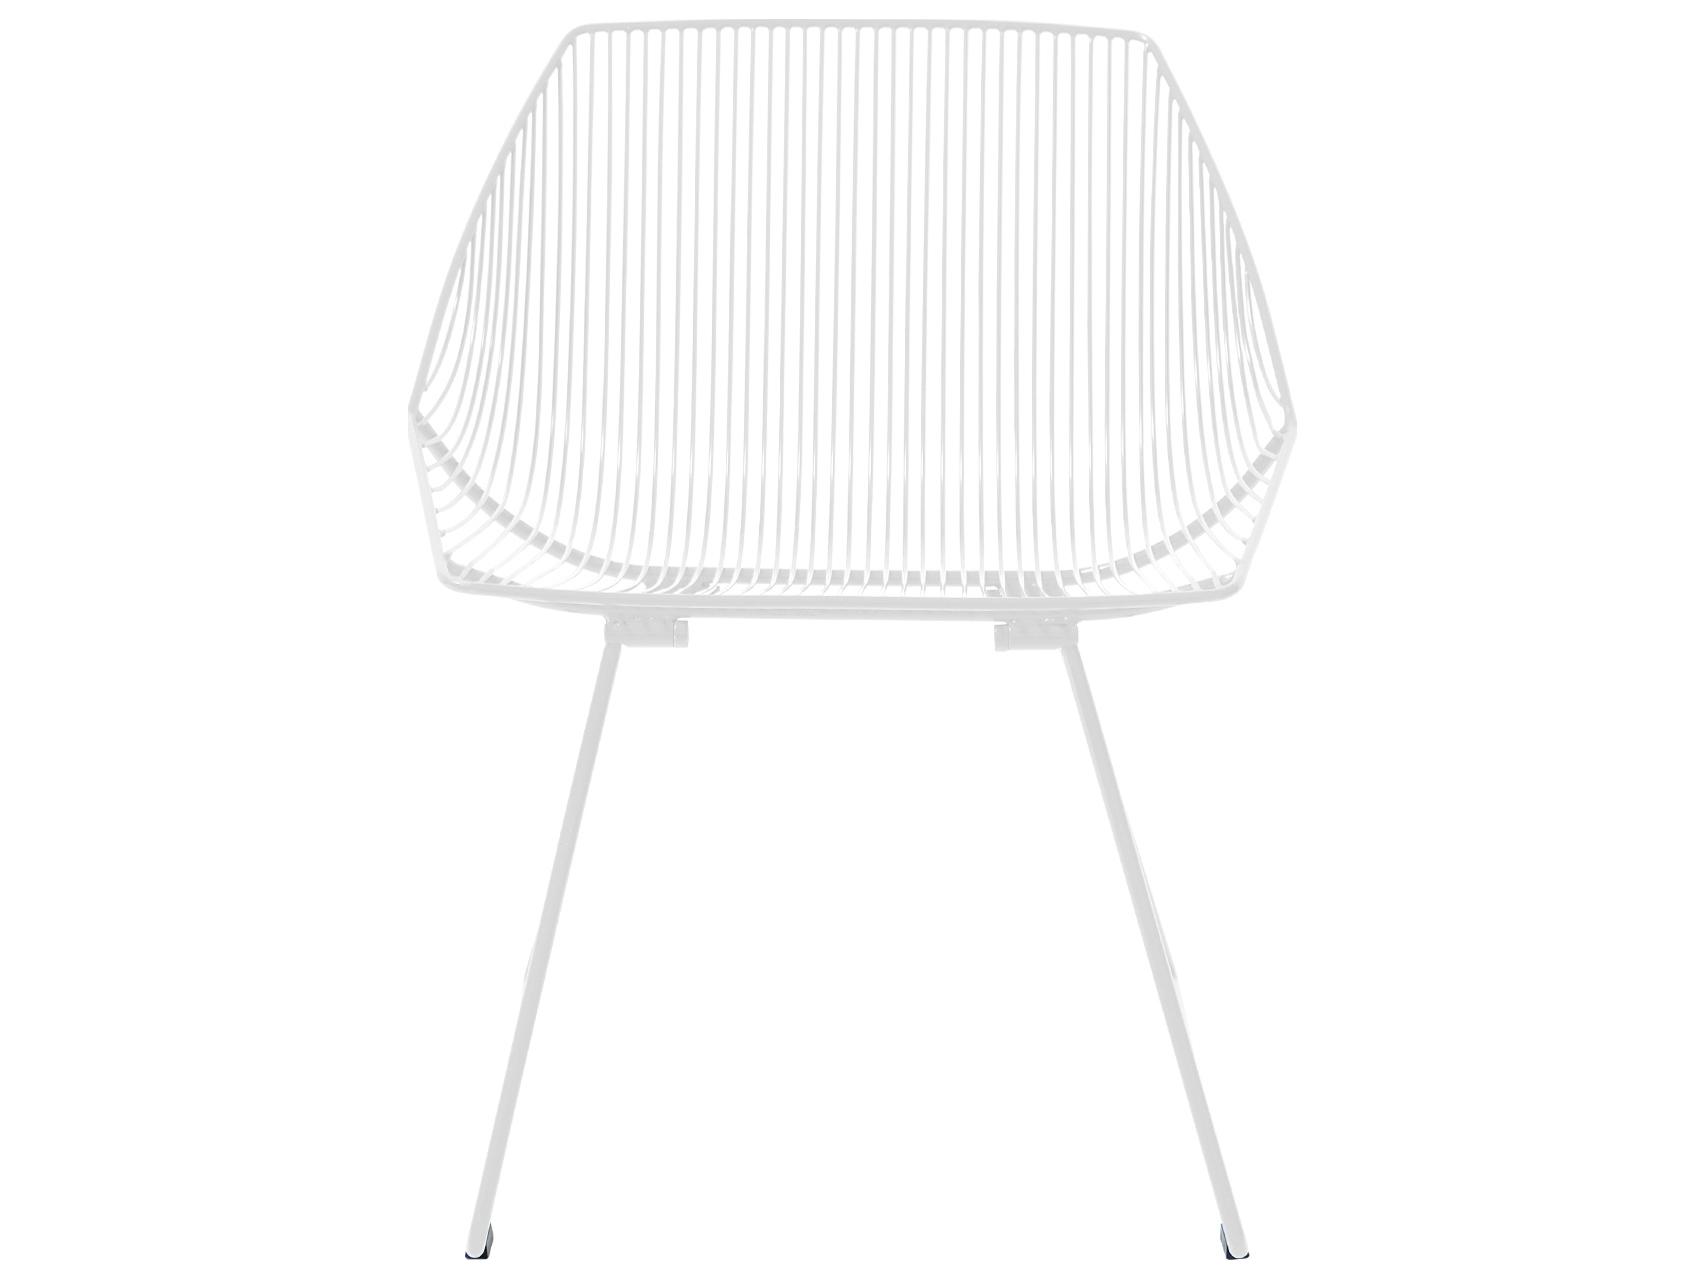 Prime Bend Goods Outdoor Bunny White Metal Lounge Chair Creativecarmelina Interior Chair Design Creativecarmelinacom